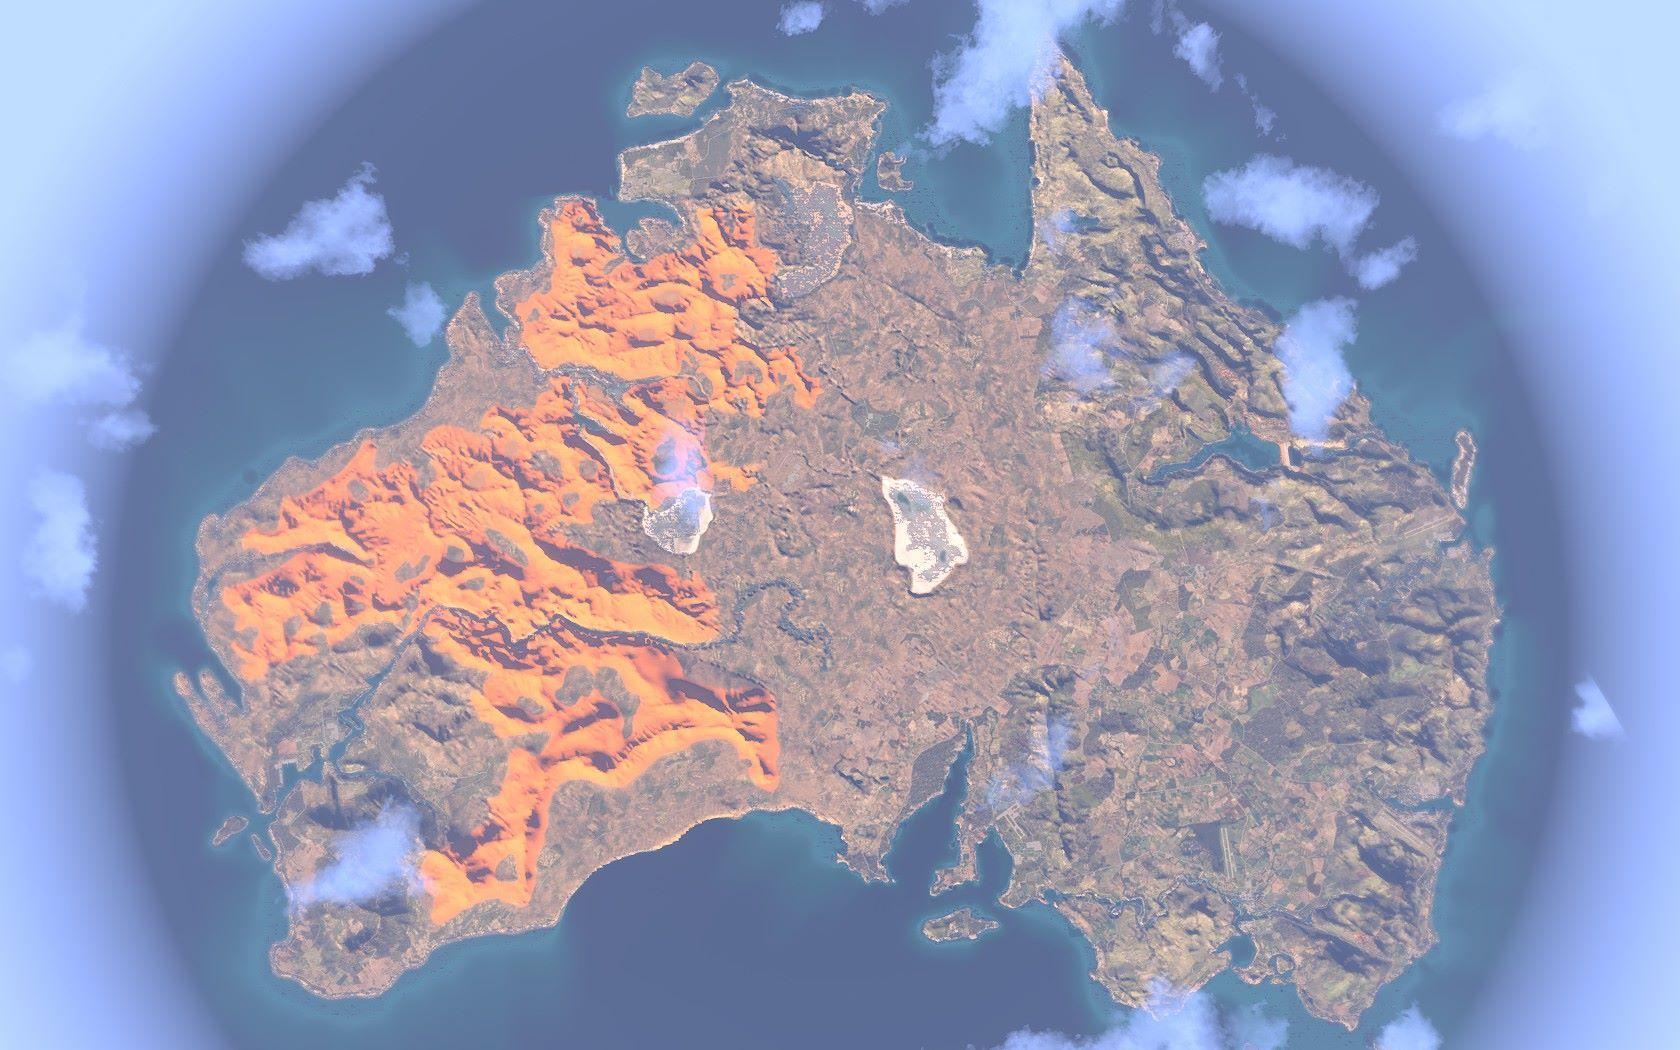 Arma 3 Map: Australia - Mod and Map Requests - AhoyWorld